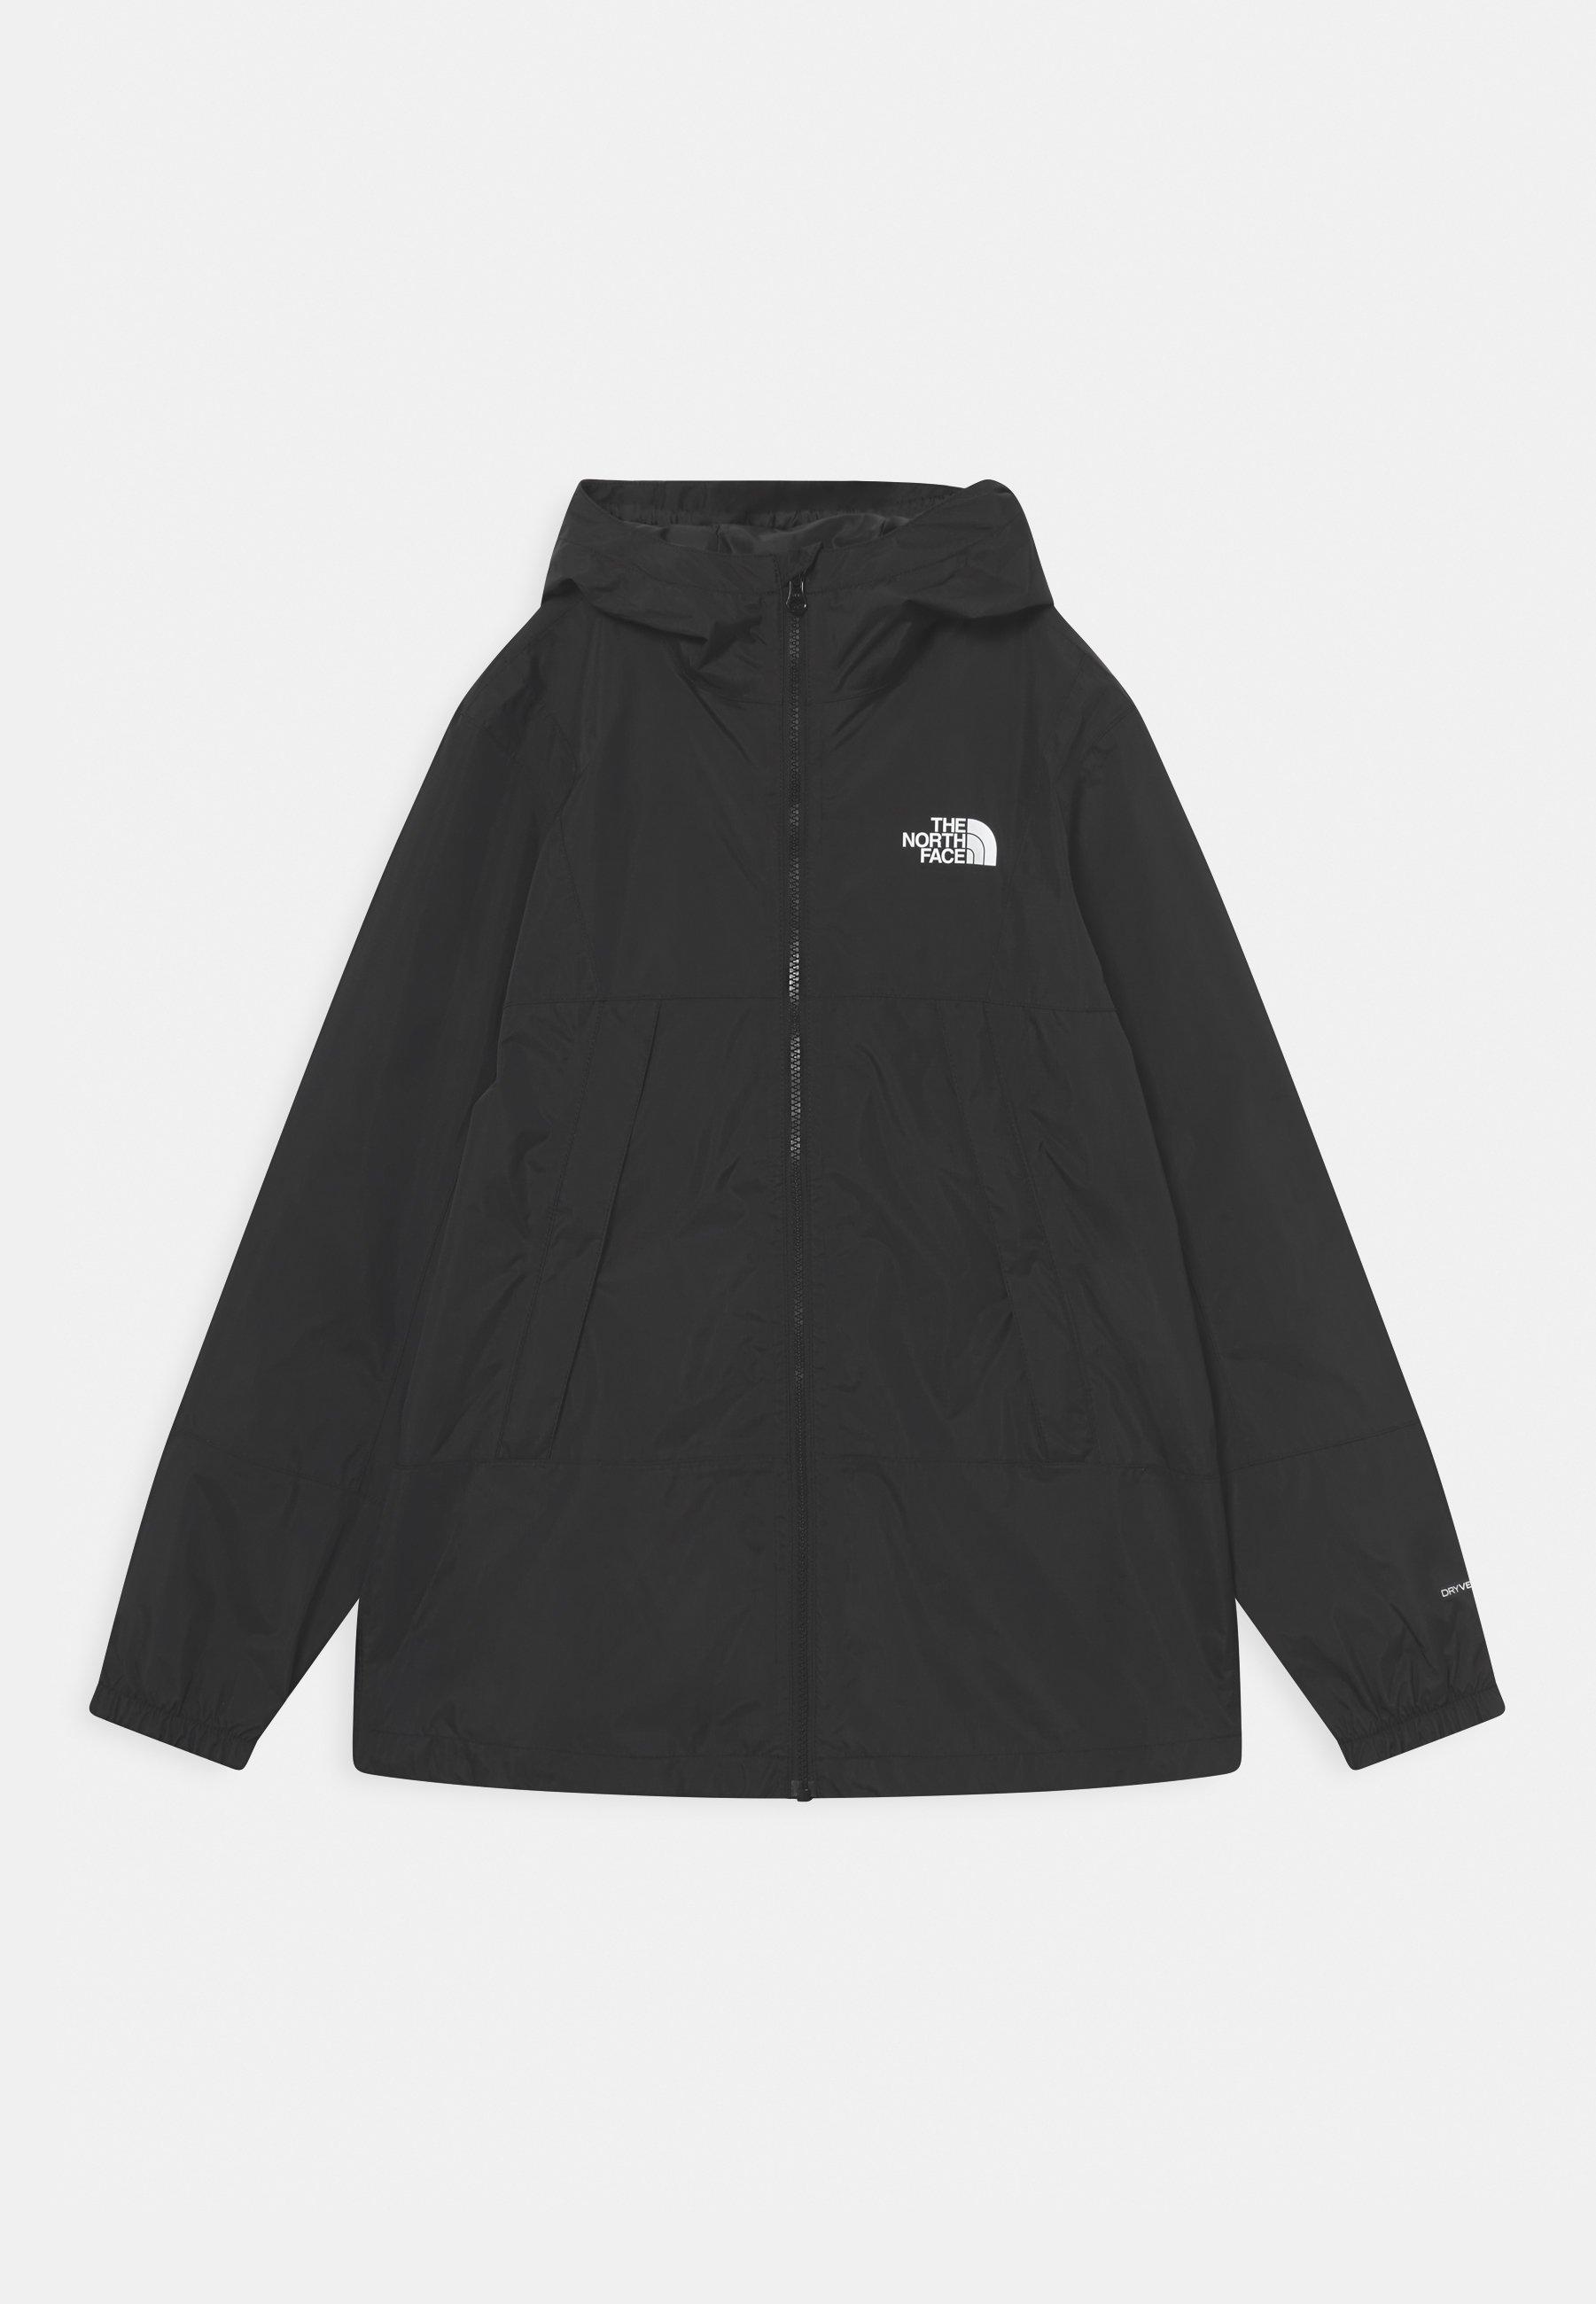 Kinder LOBUCHE UNISEX - Regenjacke / wasserabweisende Jacke